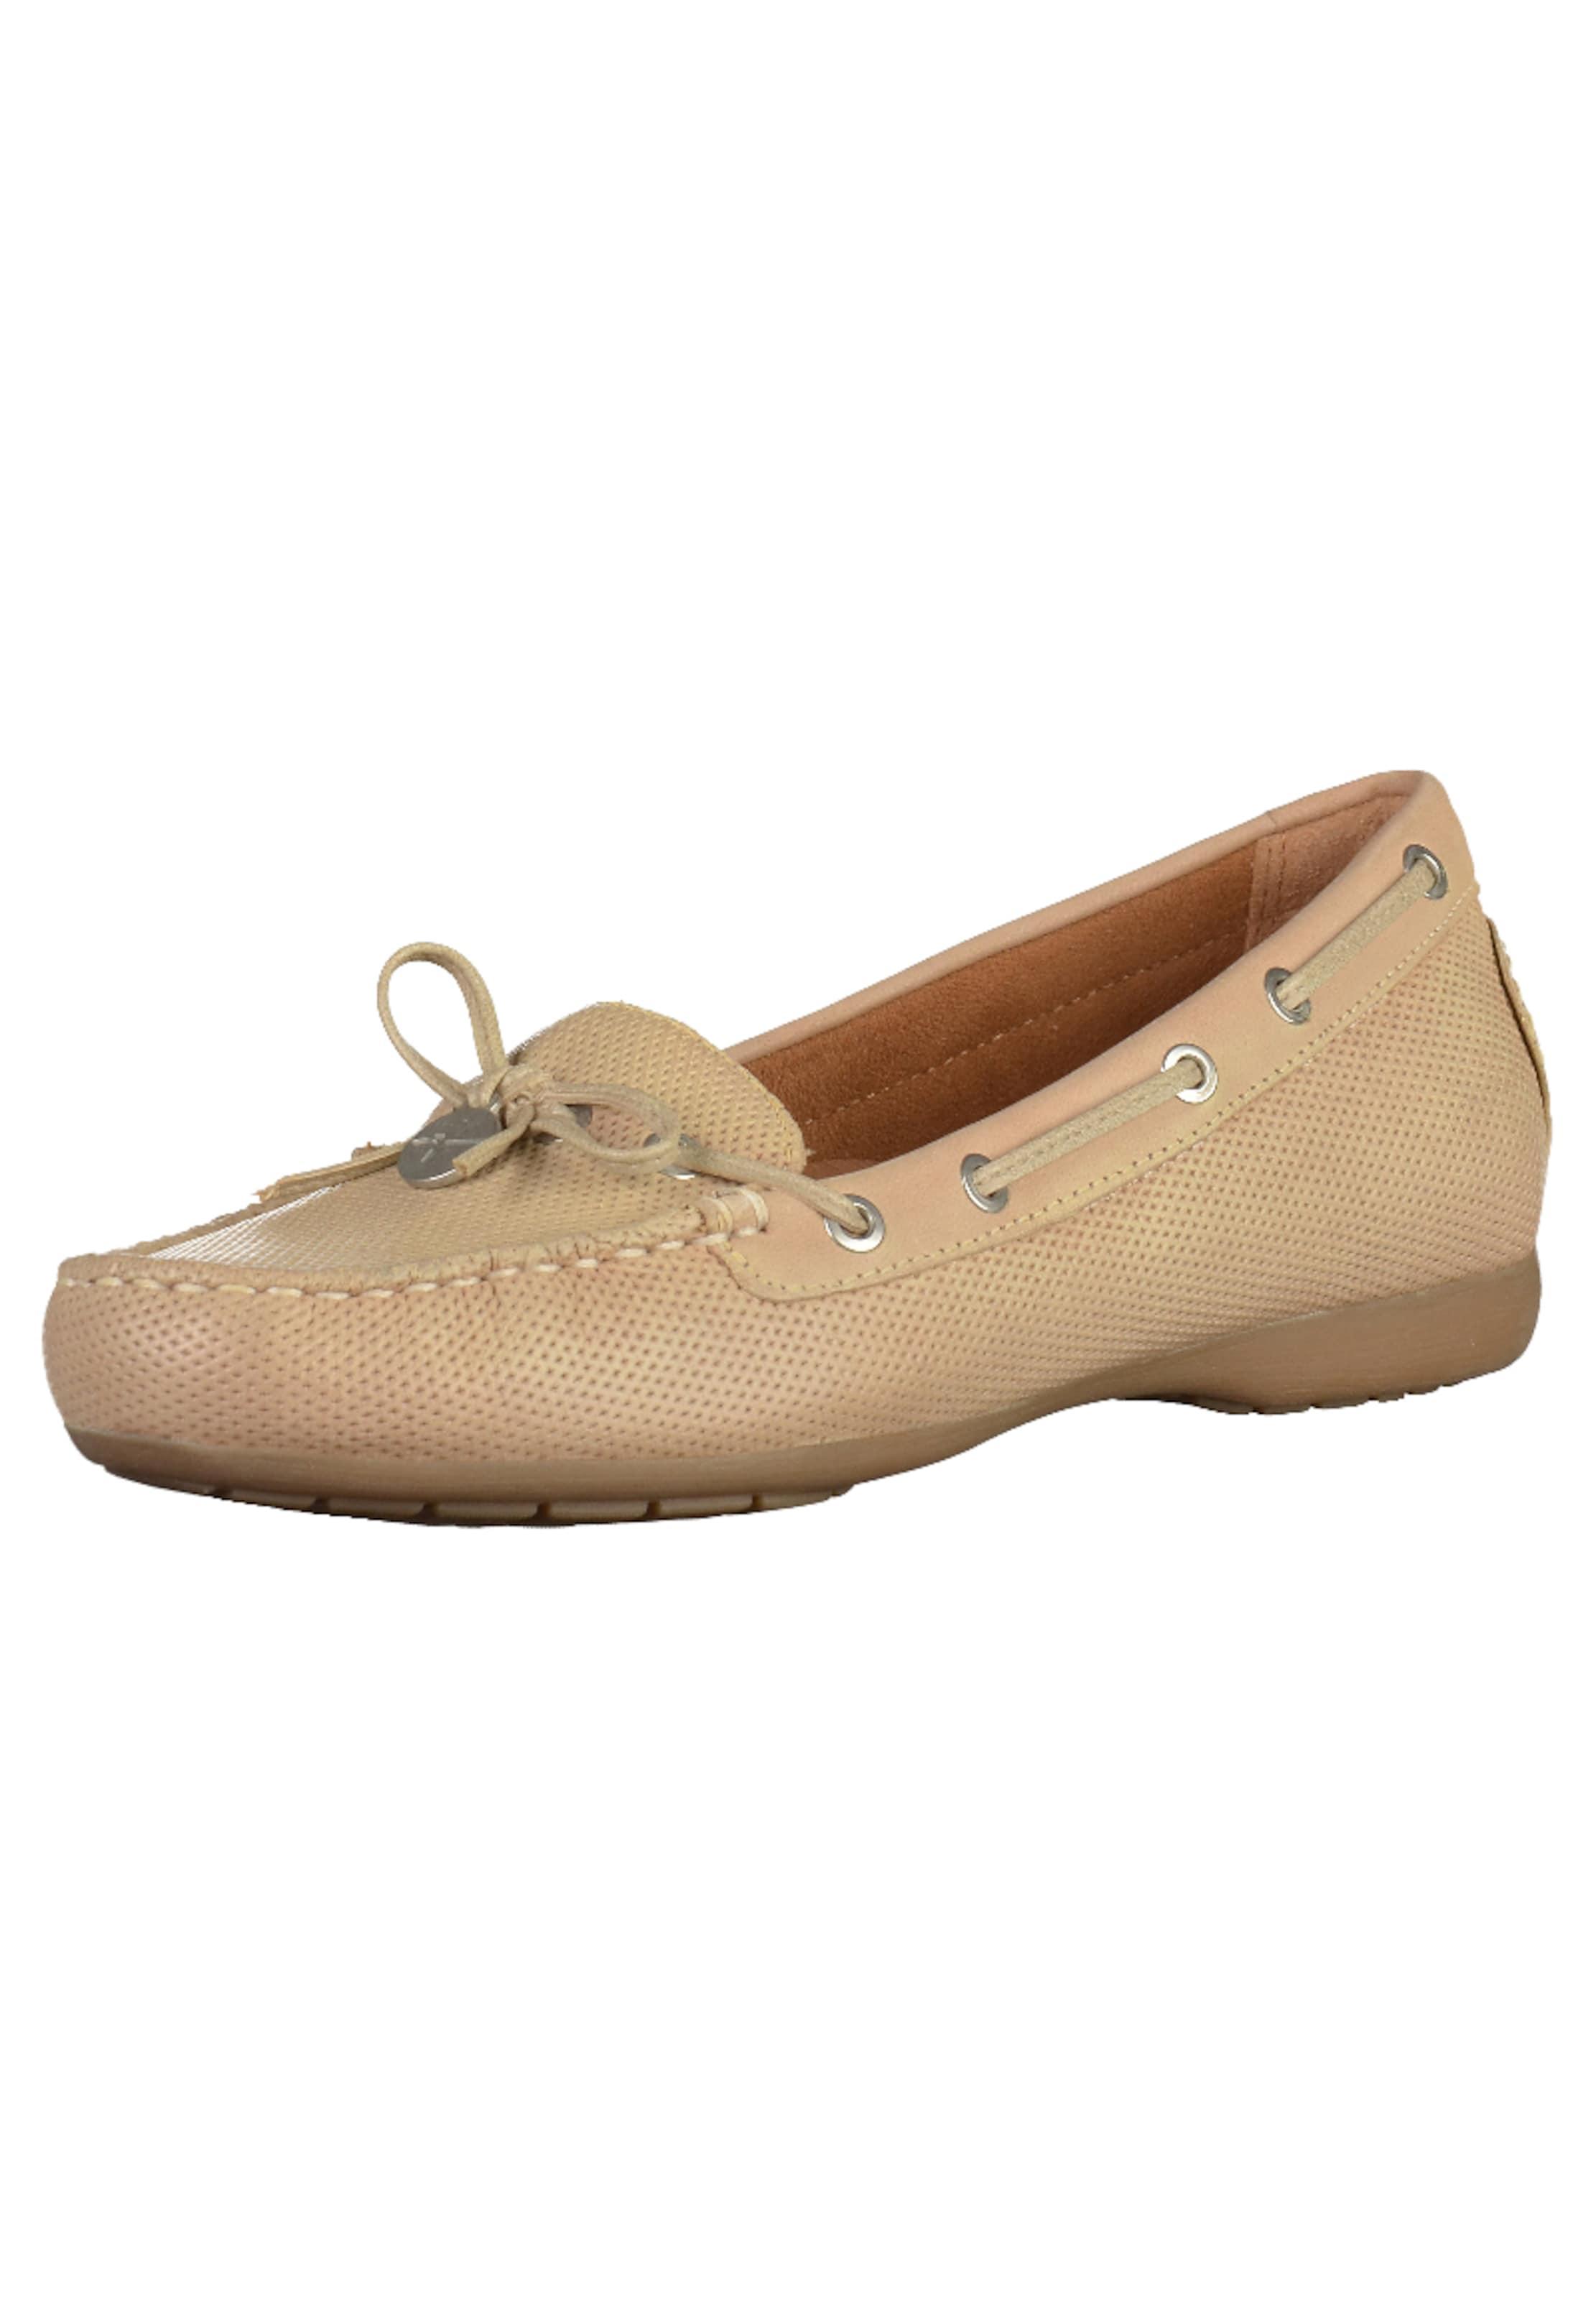 Haltbare Mode billige Schuhe TAMARIS | Mokassin Schuhe Gut getragene Schuhe